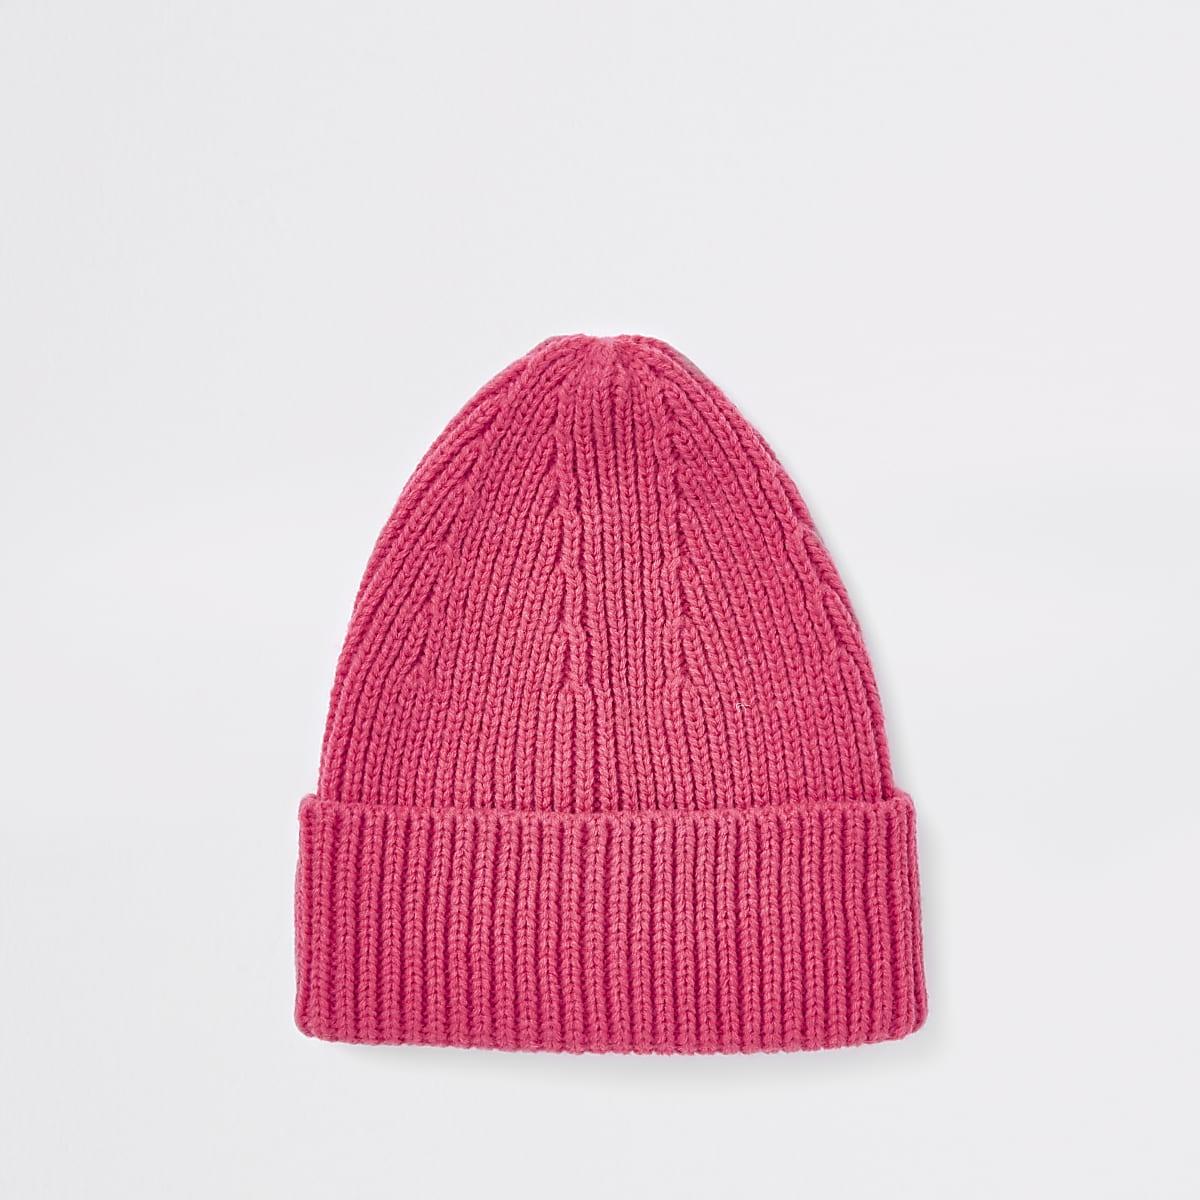 Pink fisherman knit beanie hat